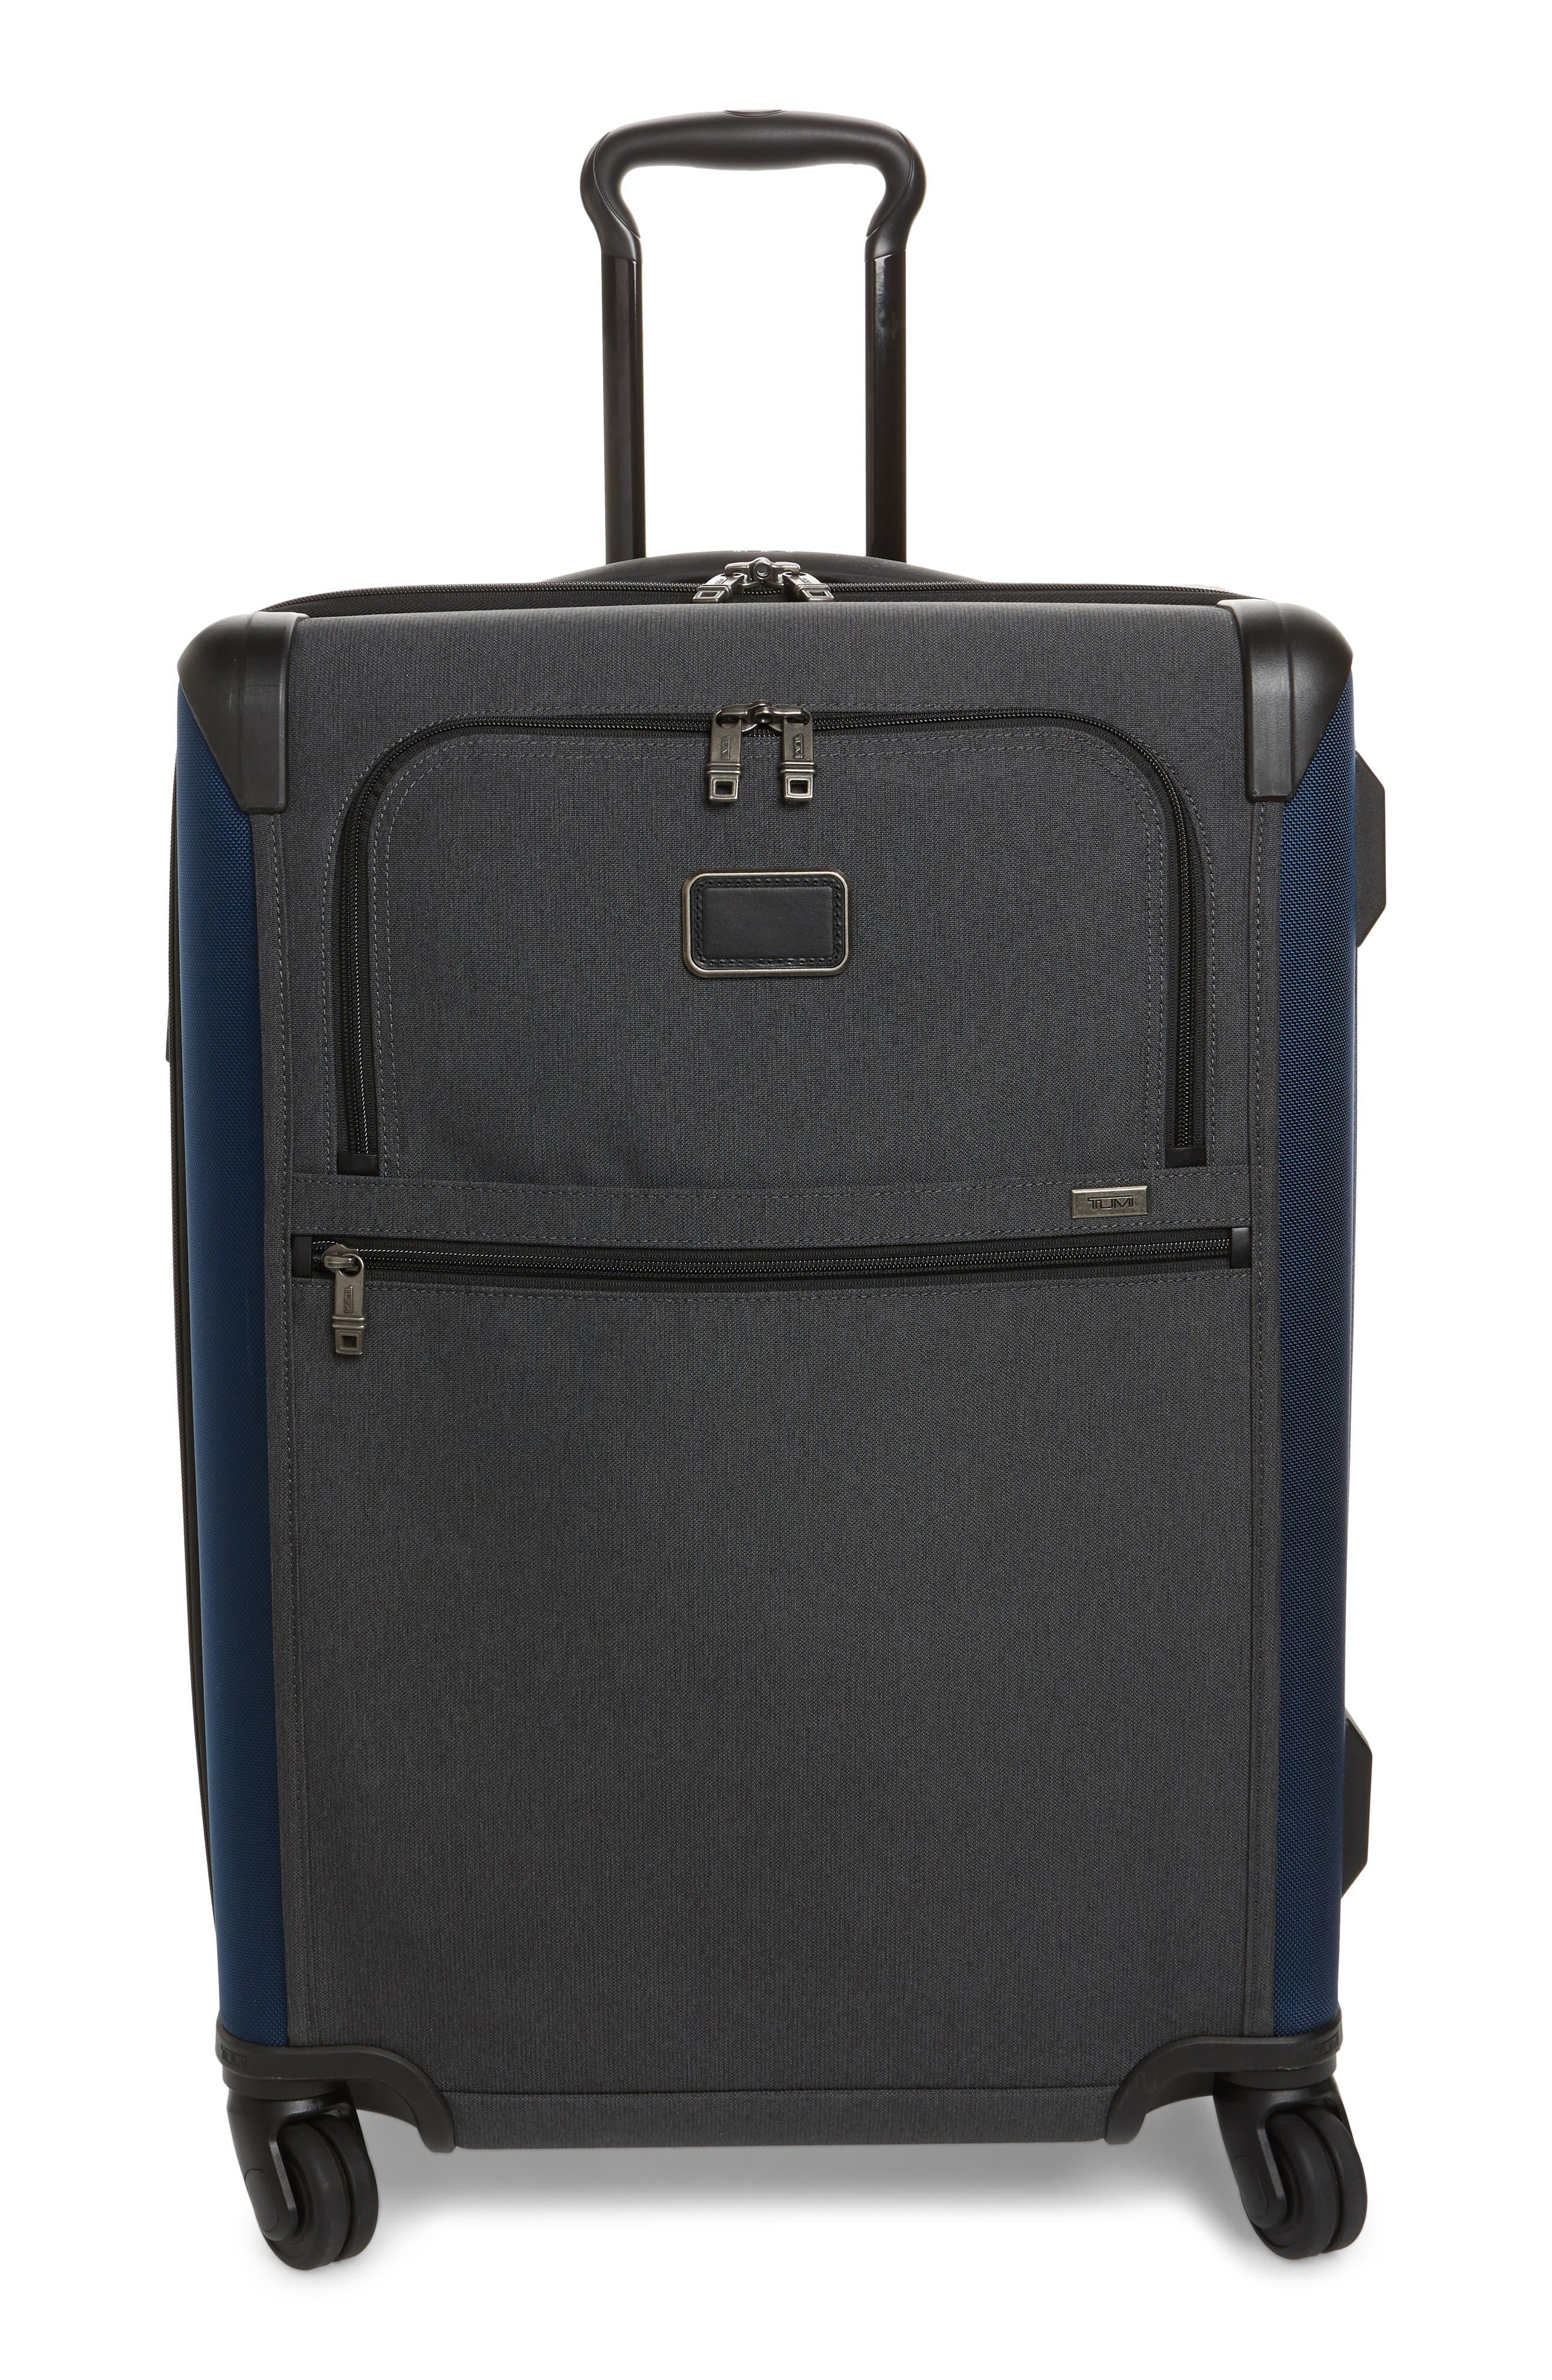 ALPHA 2 SHORT TRIP 26-INCH FOUR WHEEL PACKING CASE - BLUE